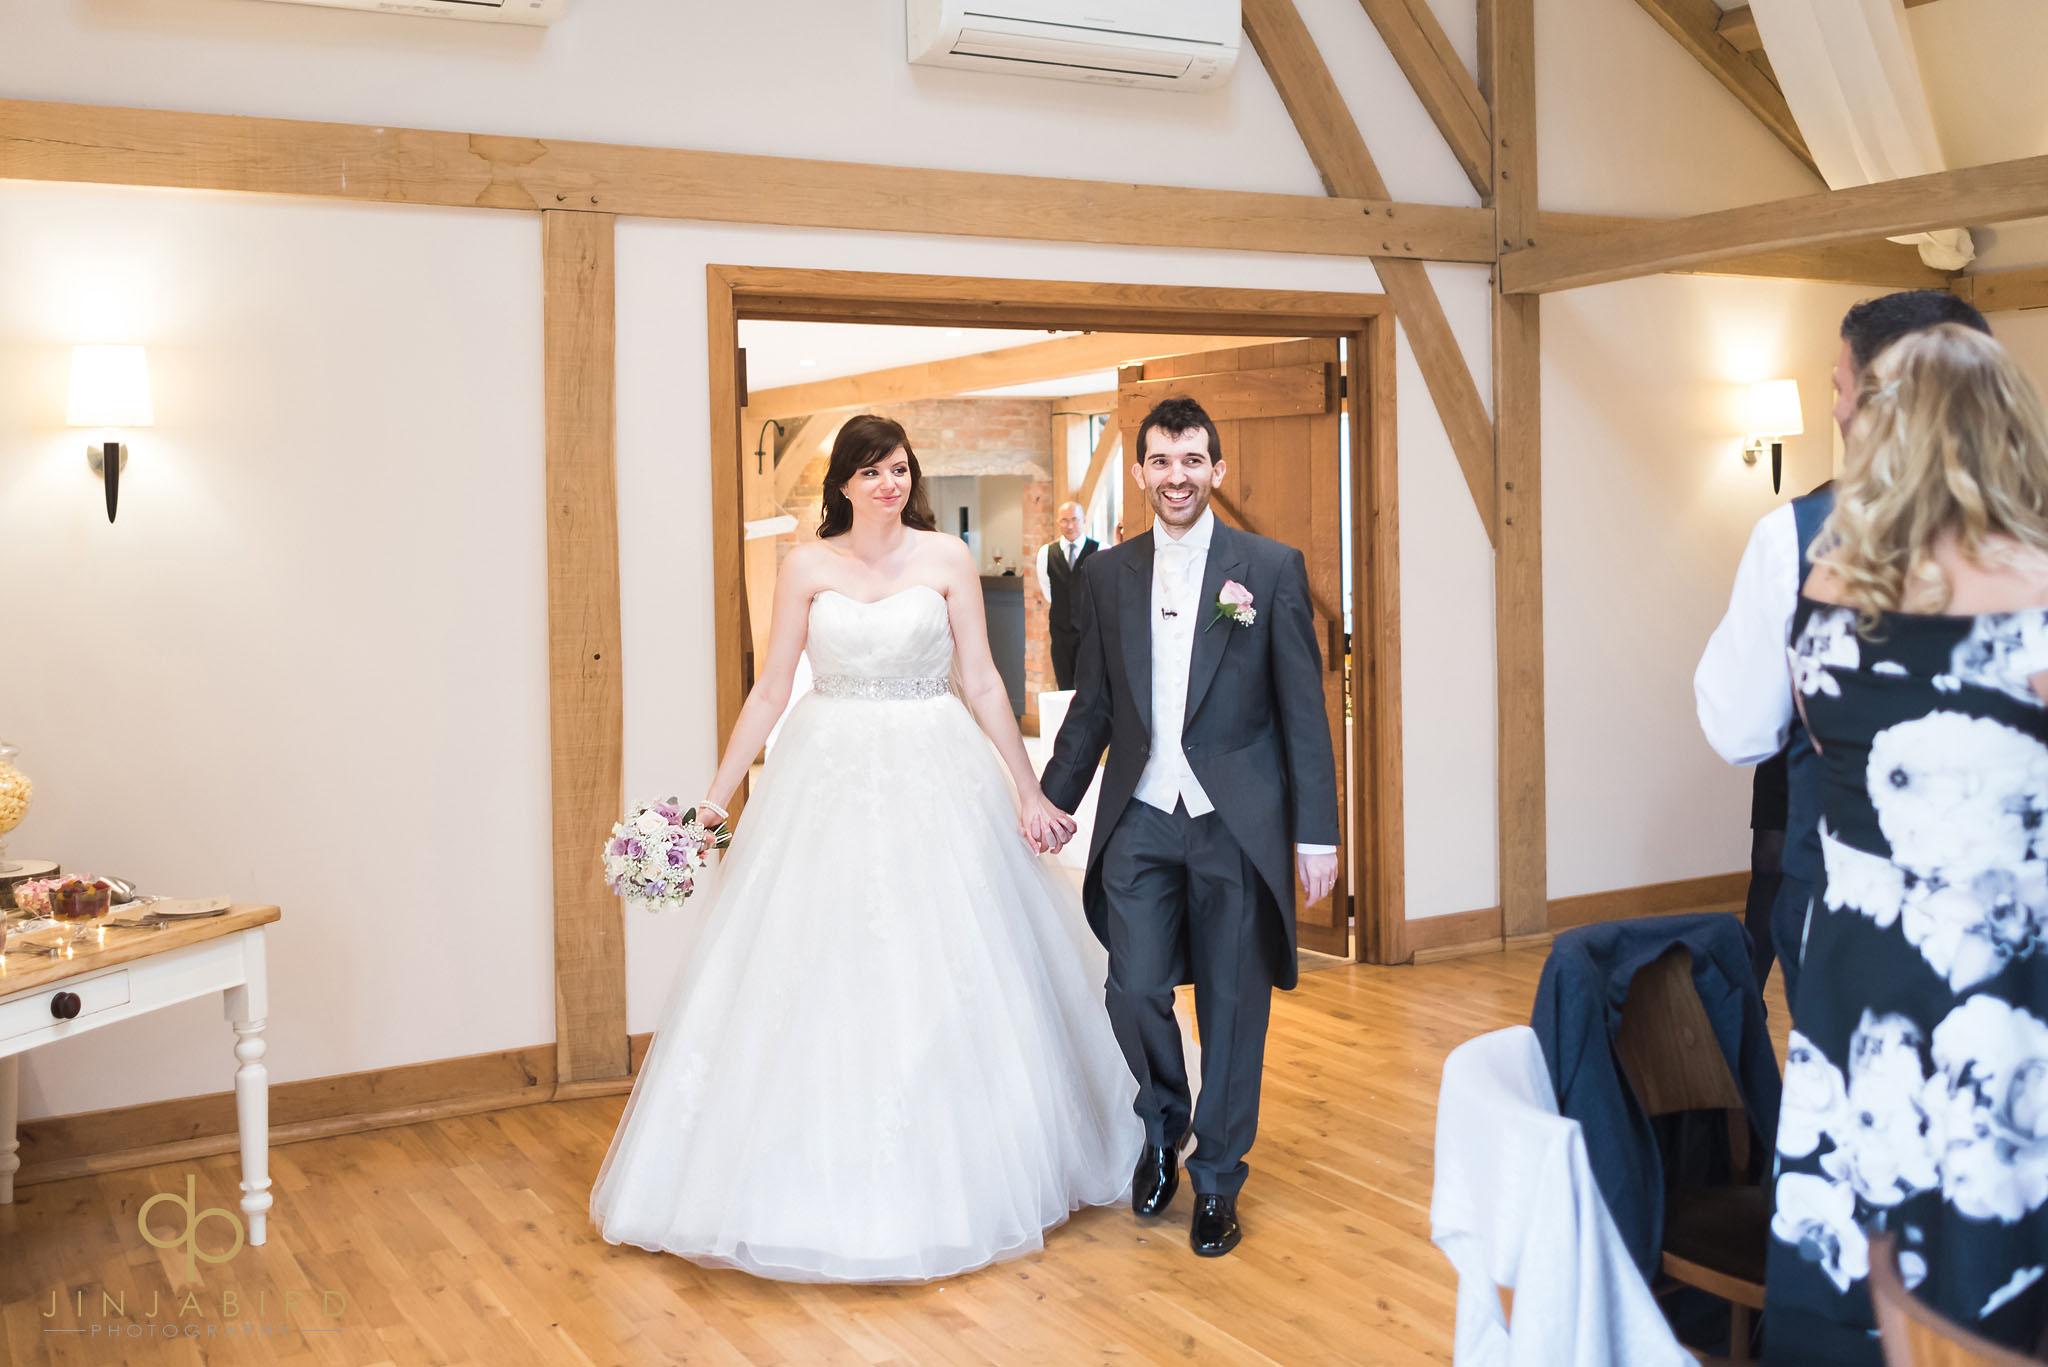 bride and groom make entrance at wedding breakfast